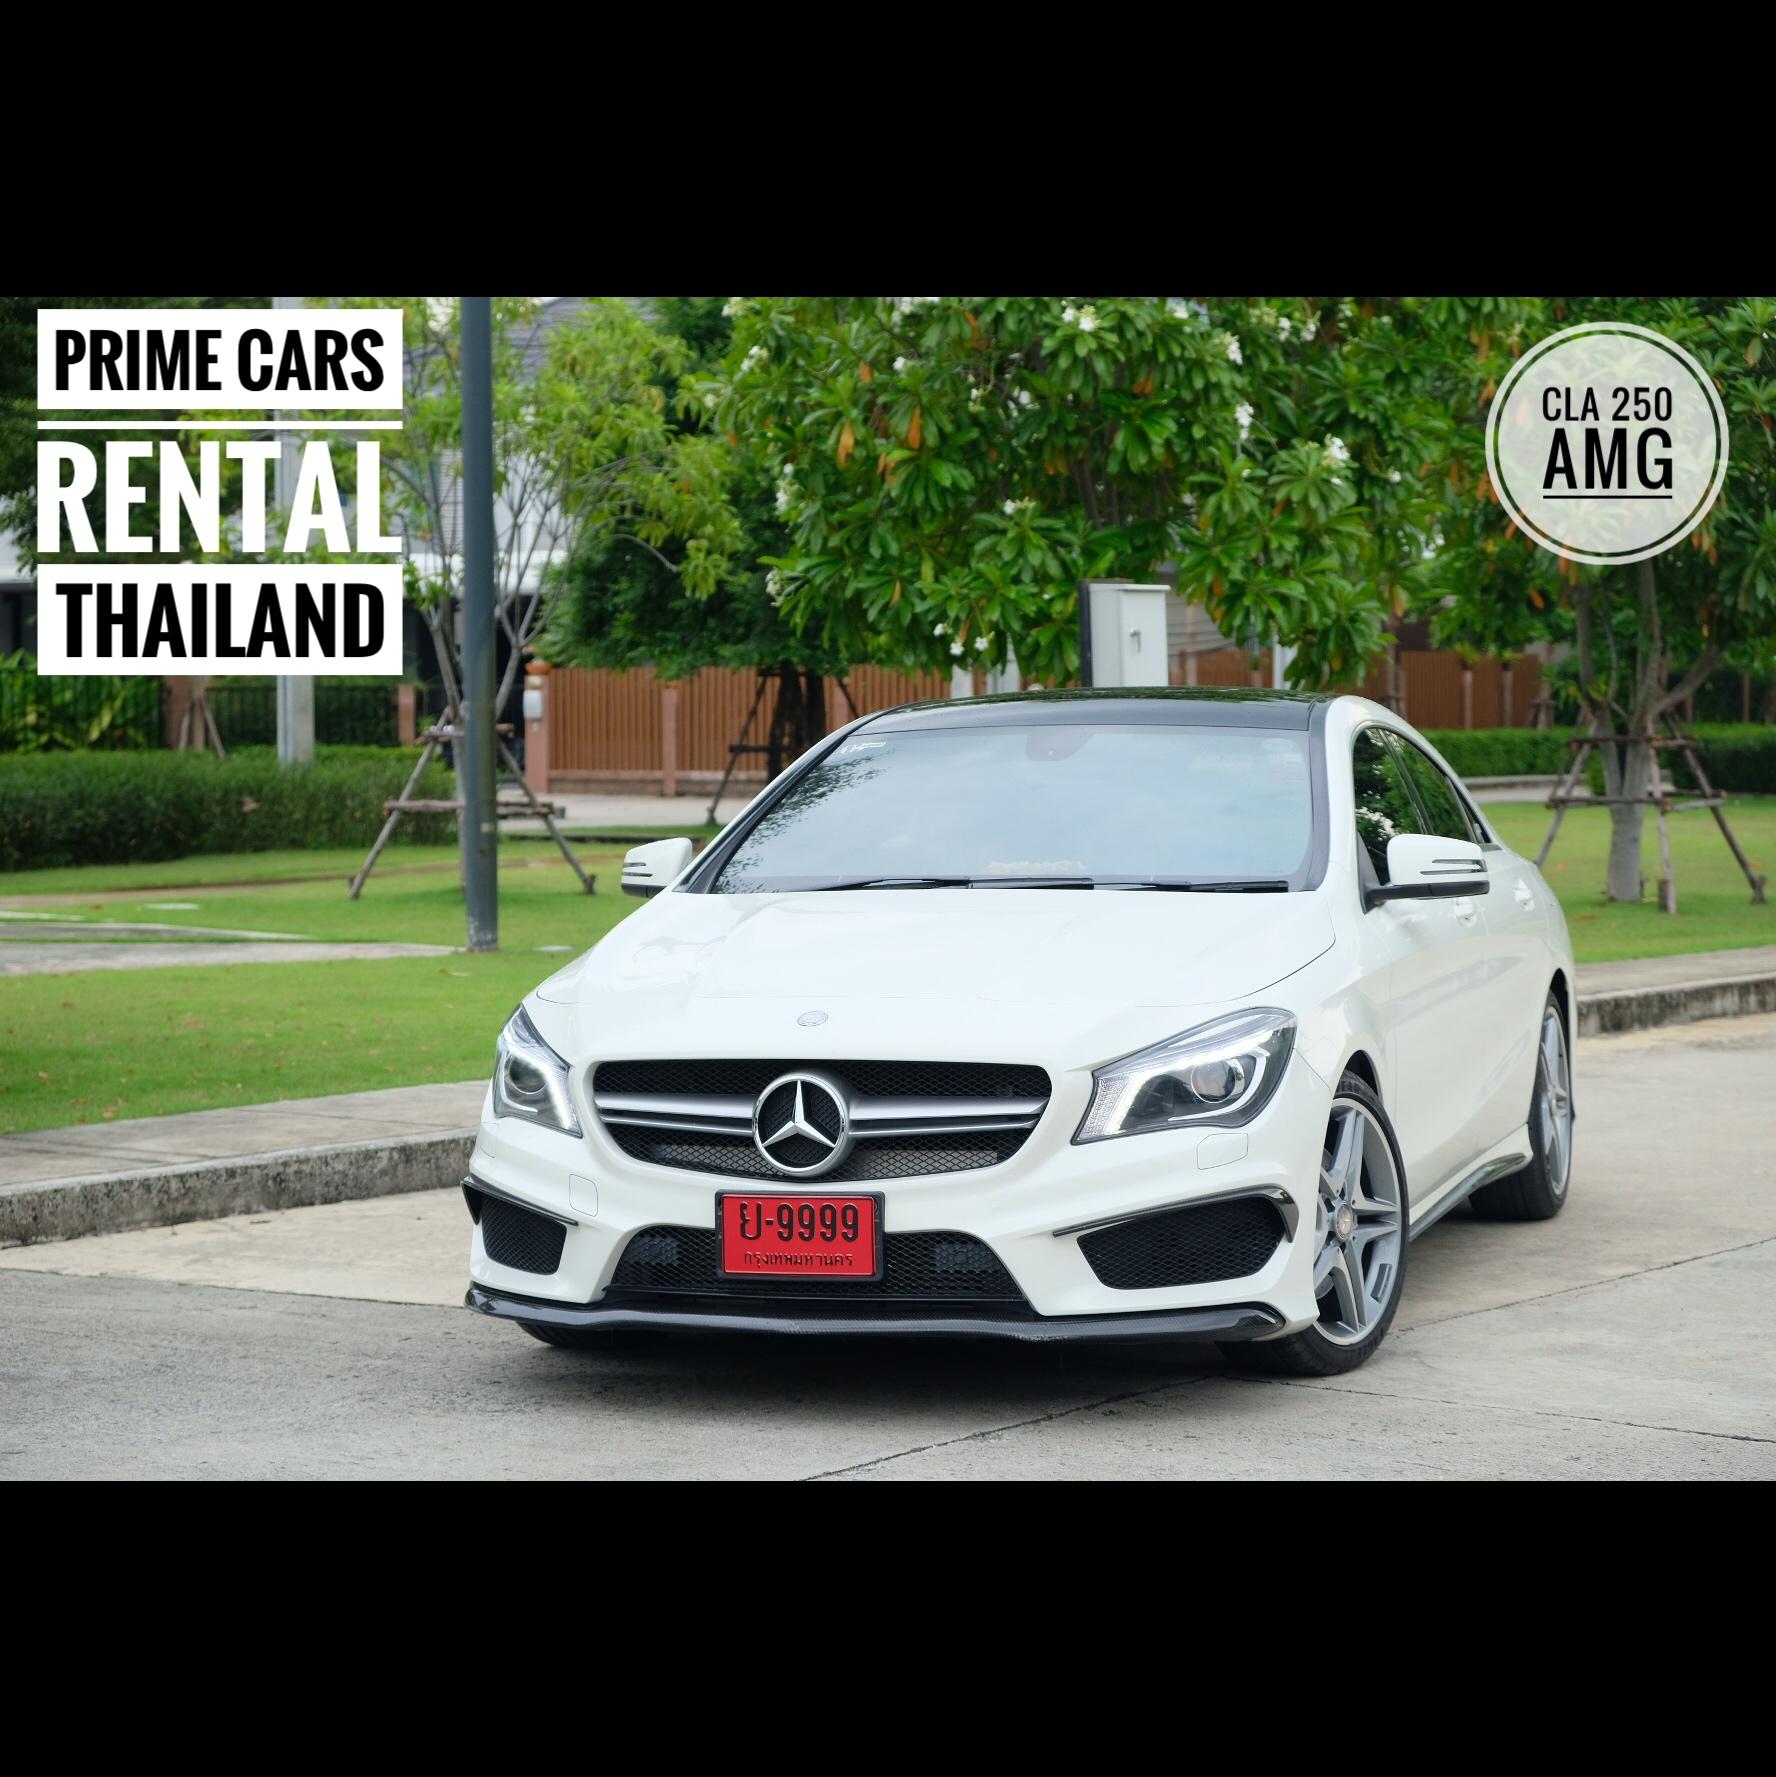 Benz cla250amg prime cars rental for Prime motor cars mercedes benz